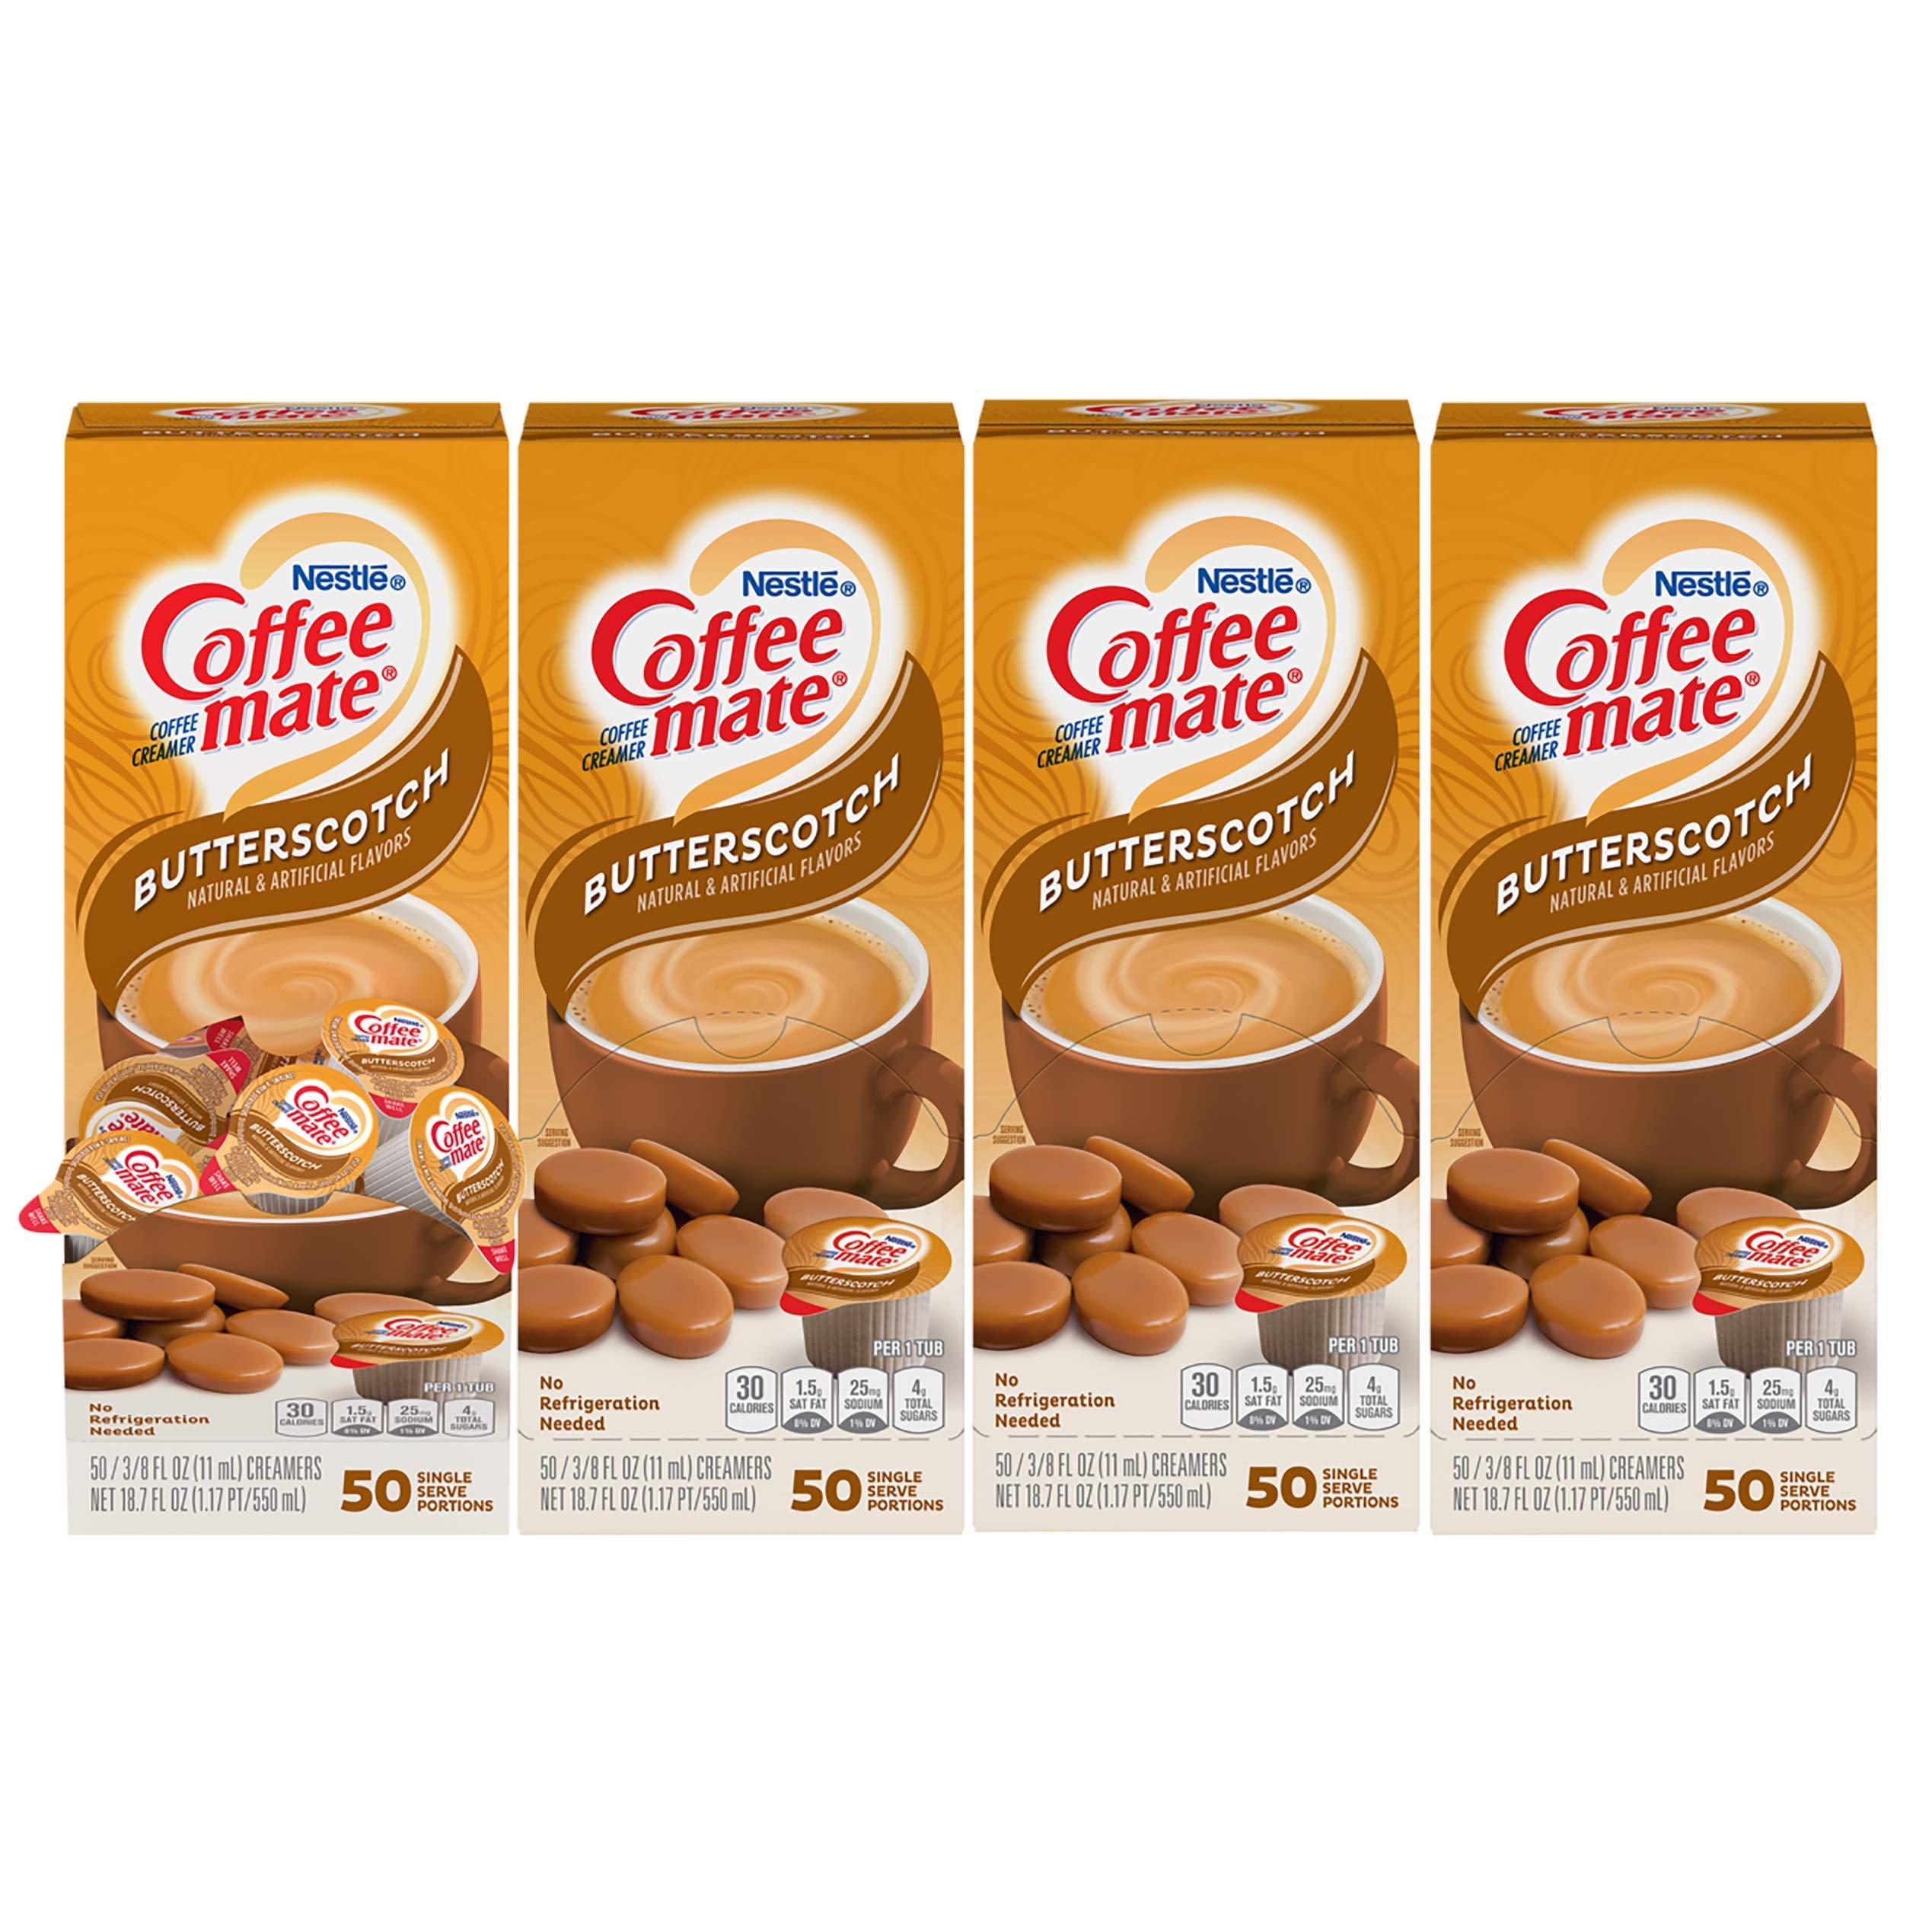 Nestle Coffee mate Coffee Creamer, Butterscotch Liquid Creamer Singles, Non Dairy, No Refrigeration, Box of 50 Singles (Pack of 4)